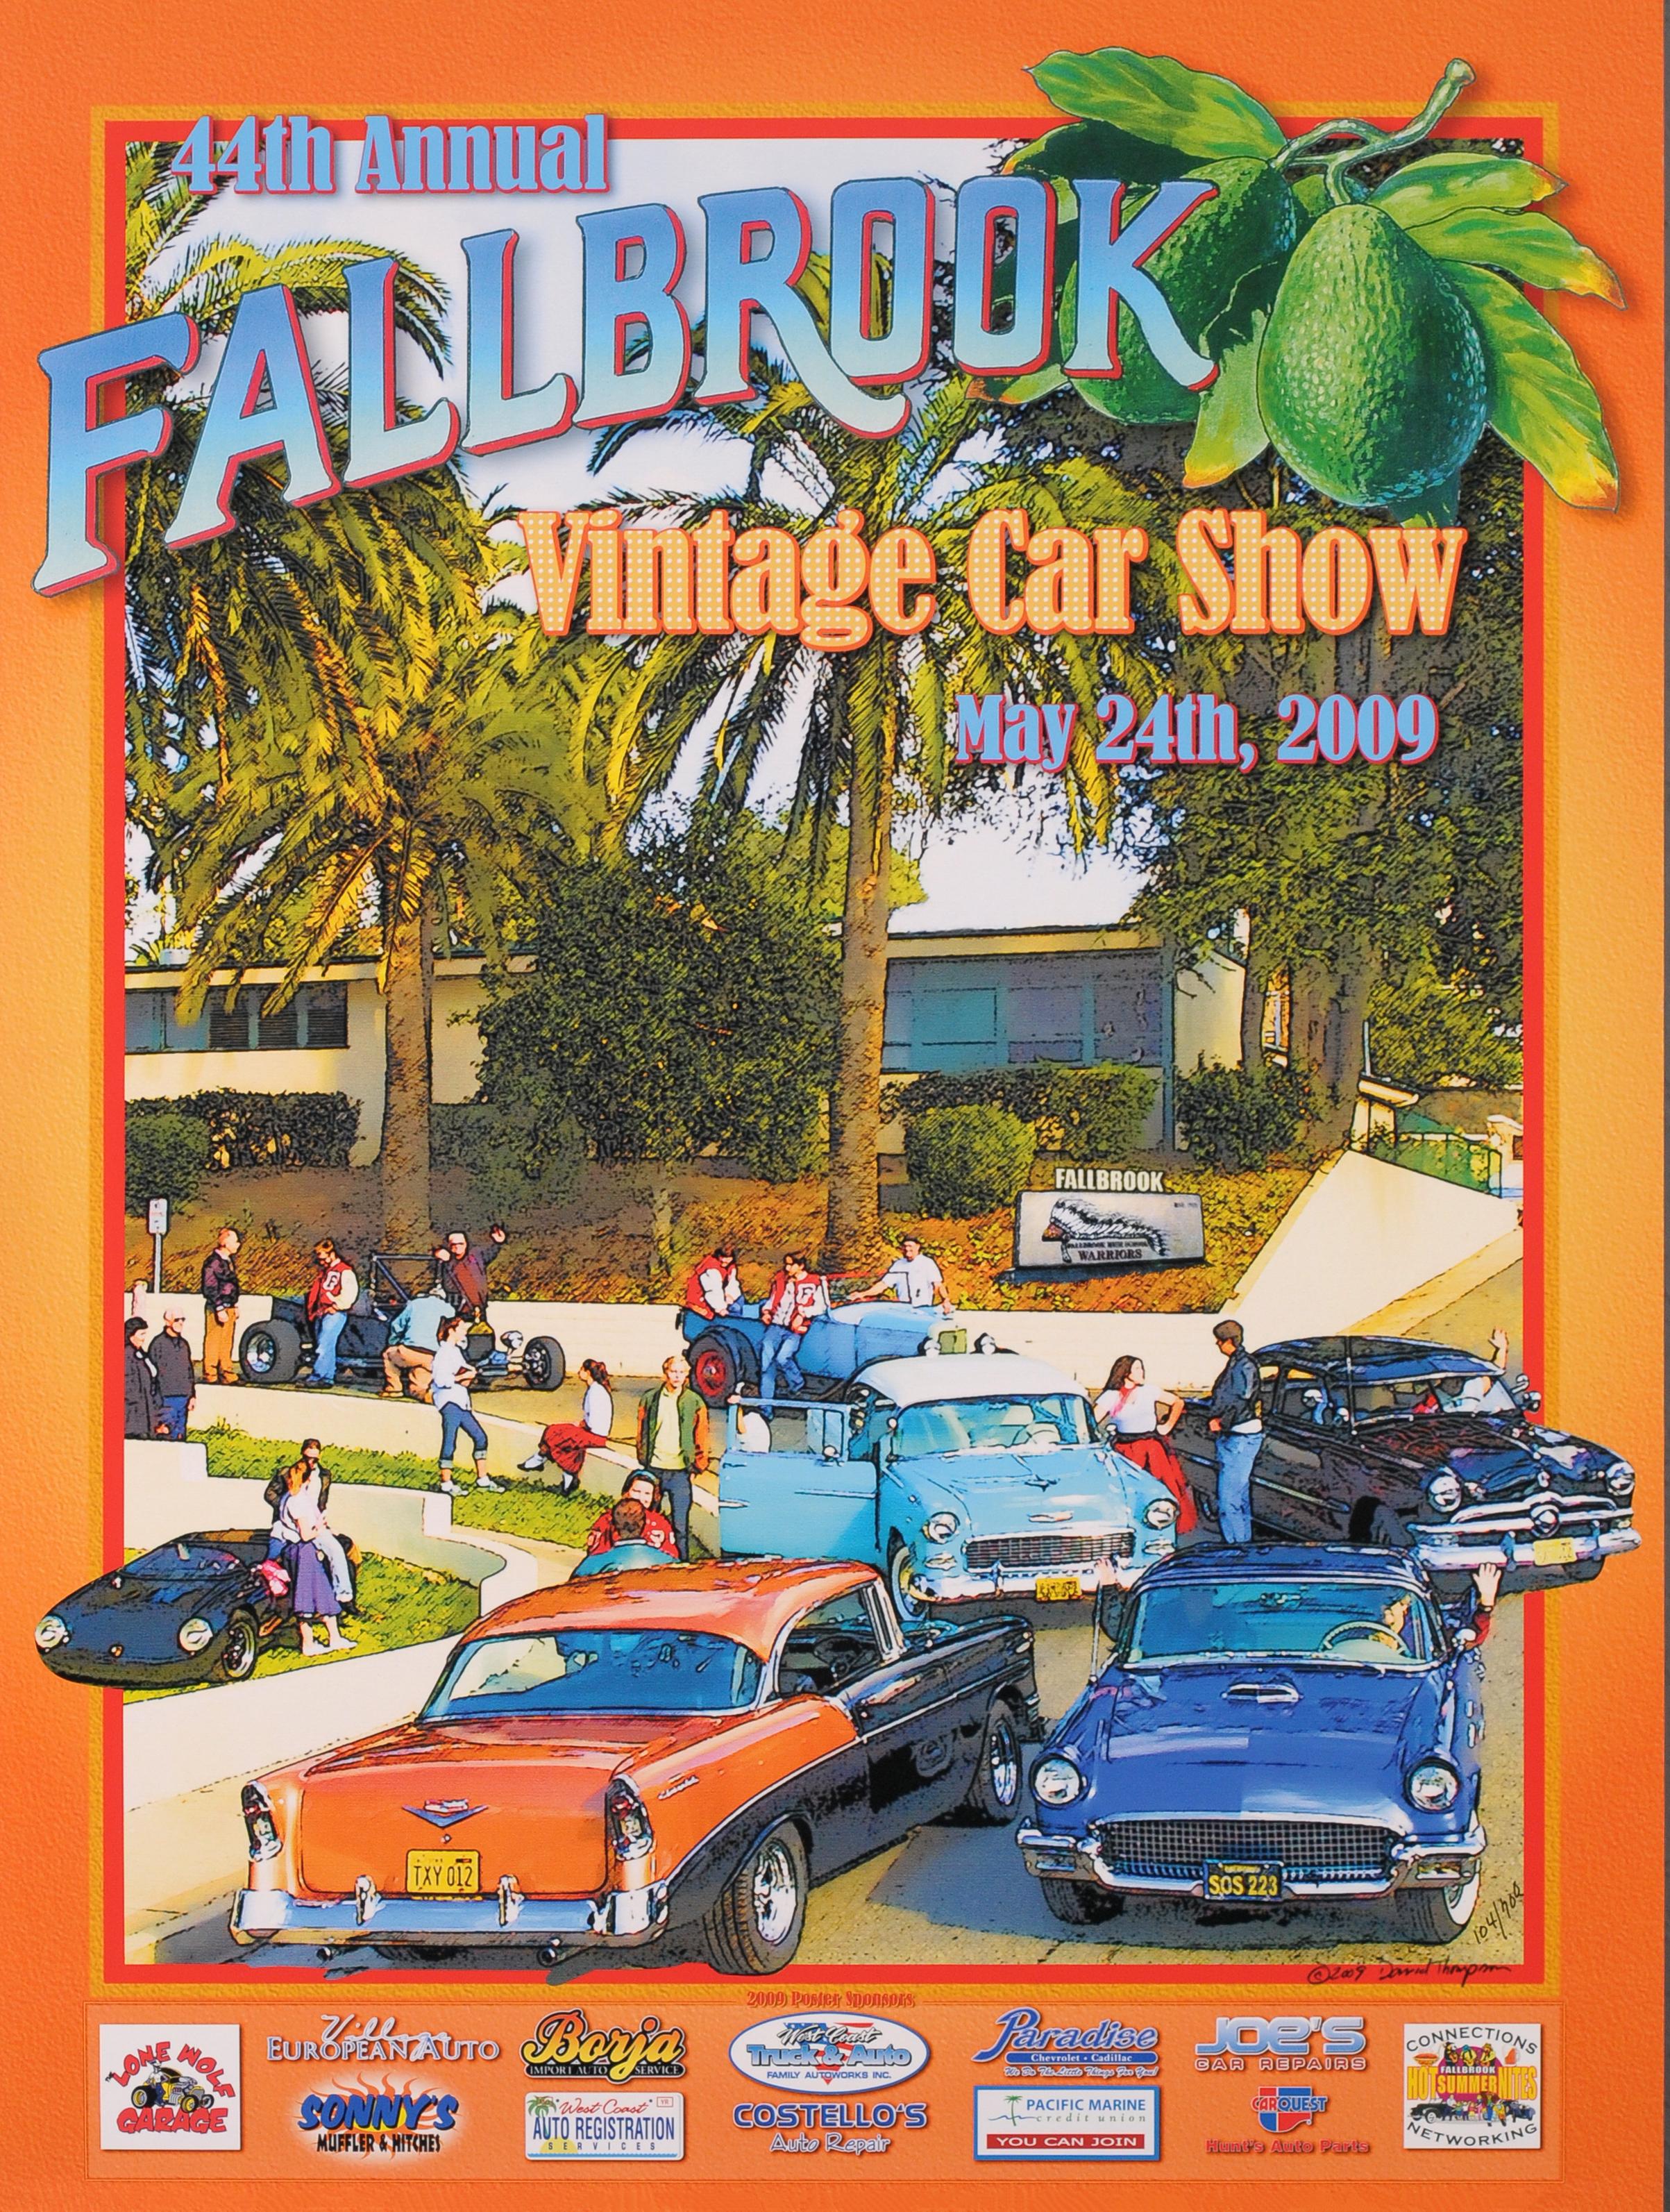 2009 Old Fallbrook High School – Fallbrook Vintage Car Club